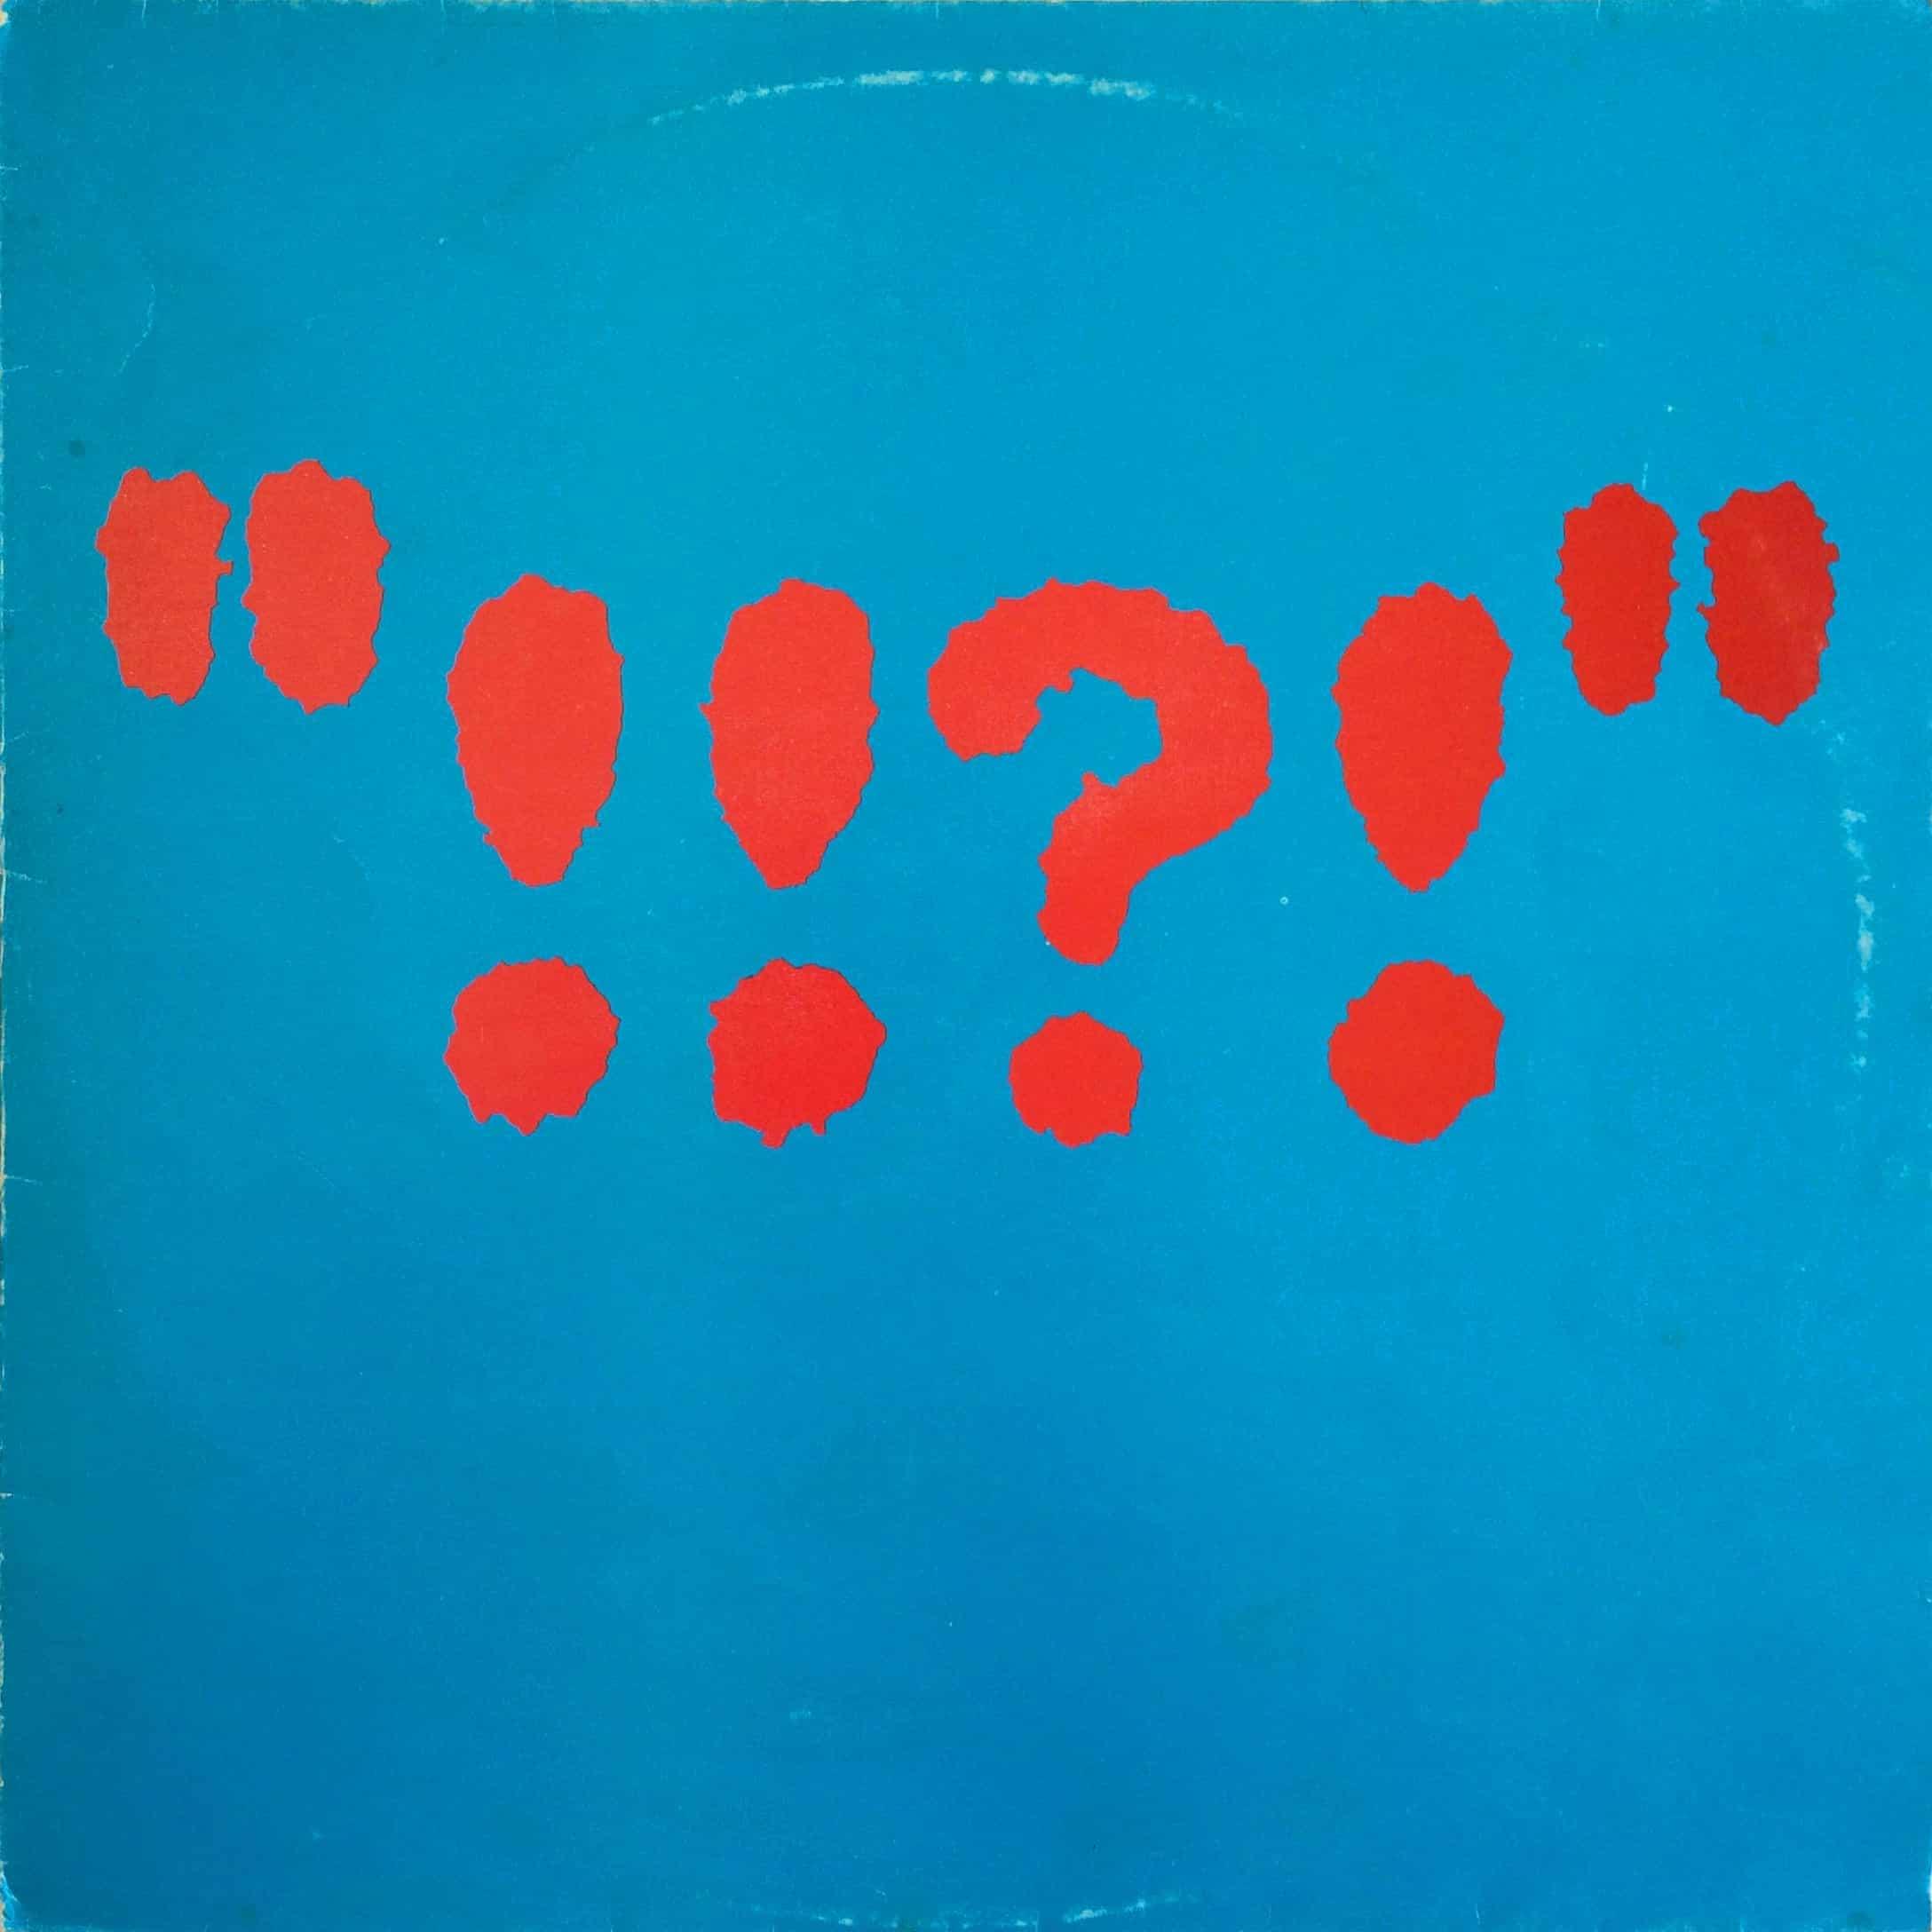 """!!?"" ... a taster! – Relentless Records – R101 UK 1982"